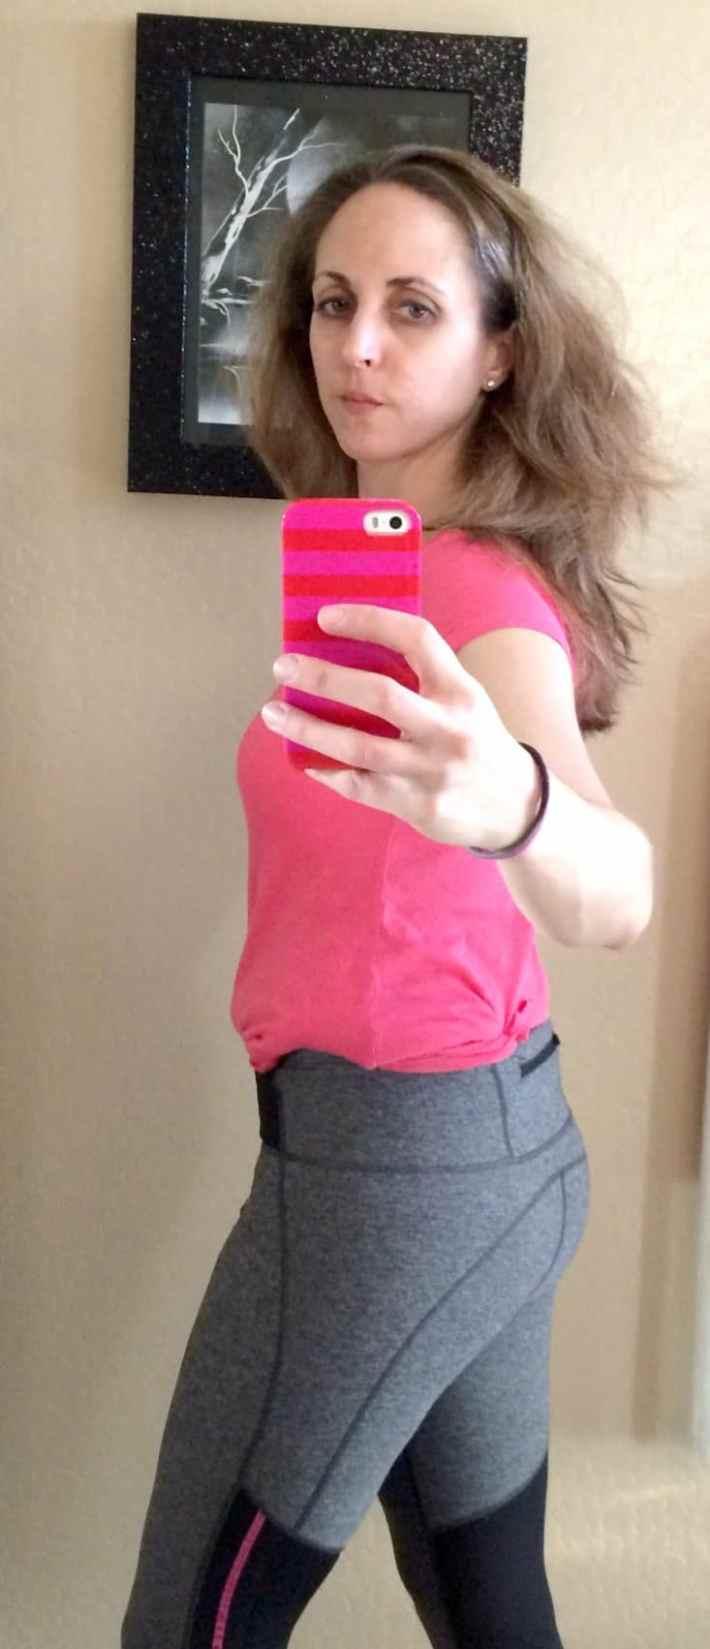 gym_selfie-5